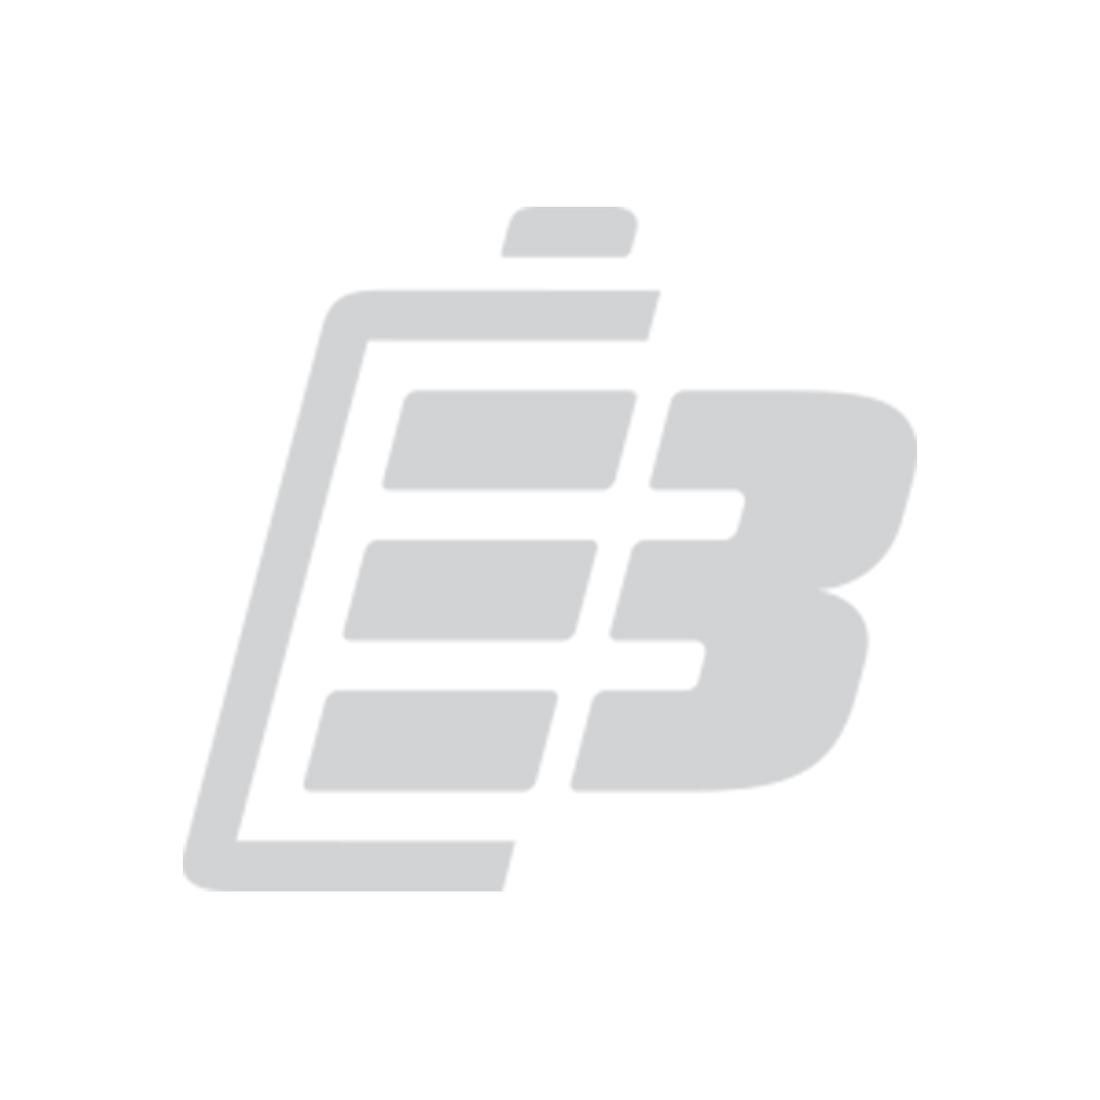 Laptop battery Apple iBook G4 14_1